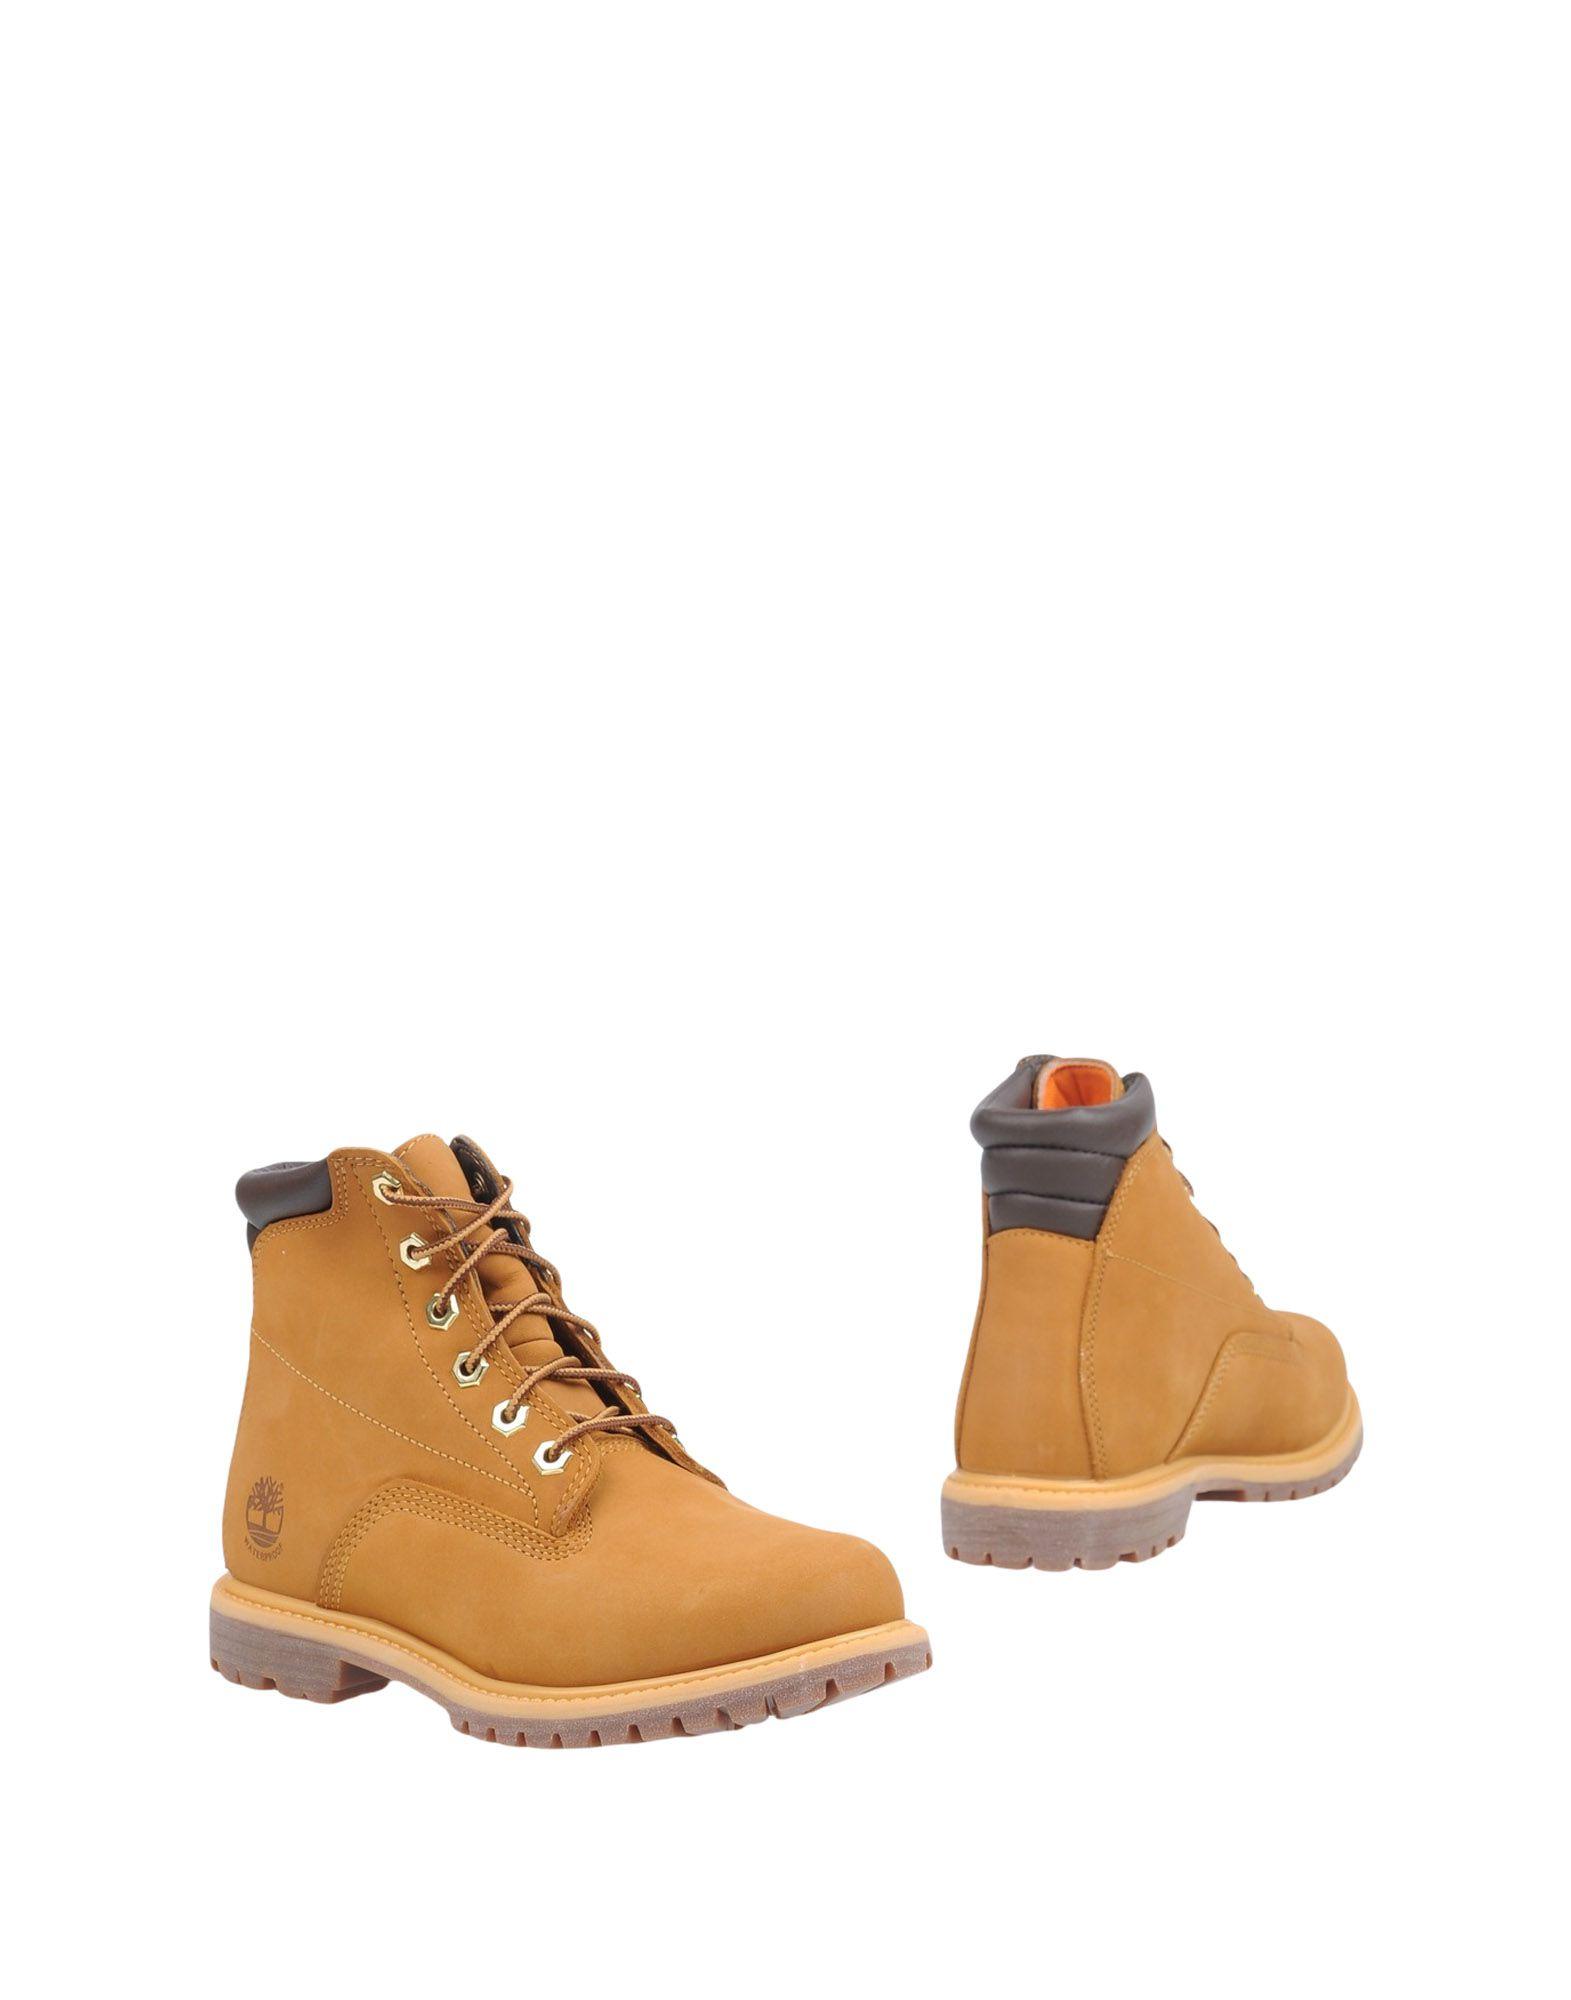 TIMBERLAND Полусапоги и высокие ботинки magazzini del sale полусапоги и высокие ботинки